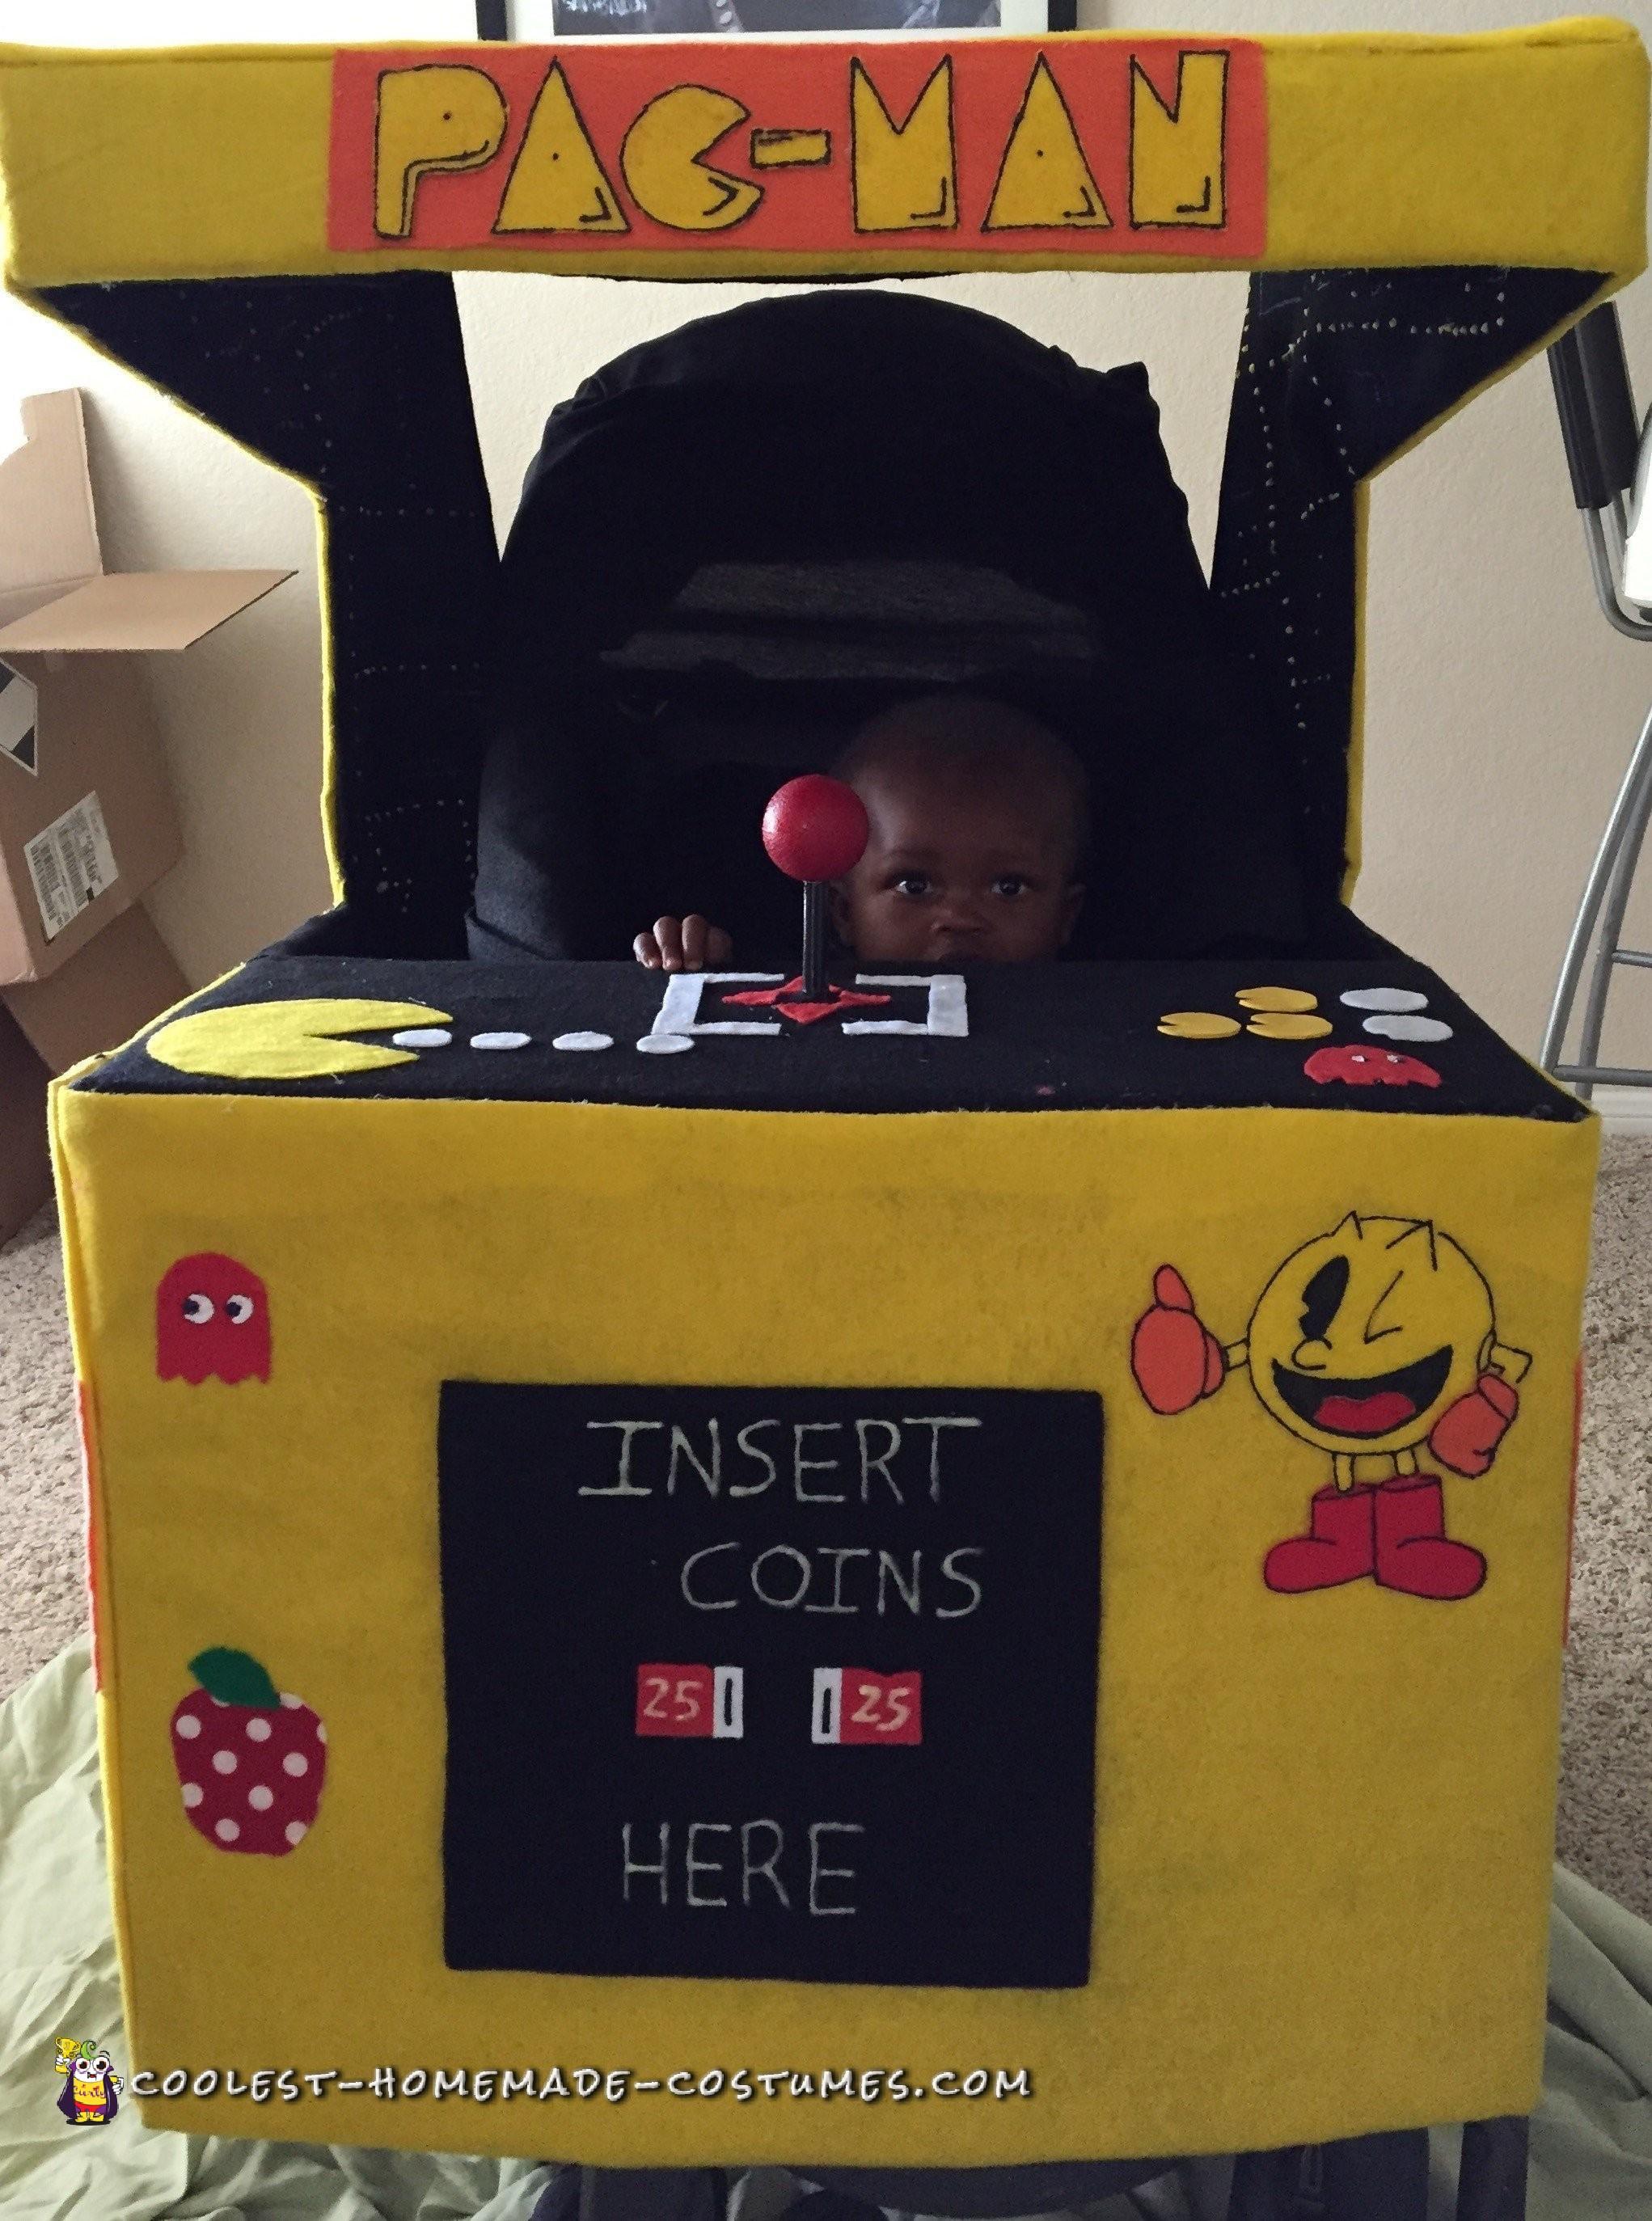 Pacman Arcade Stroller Costume